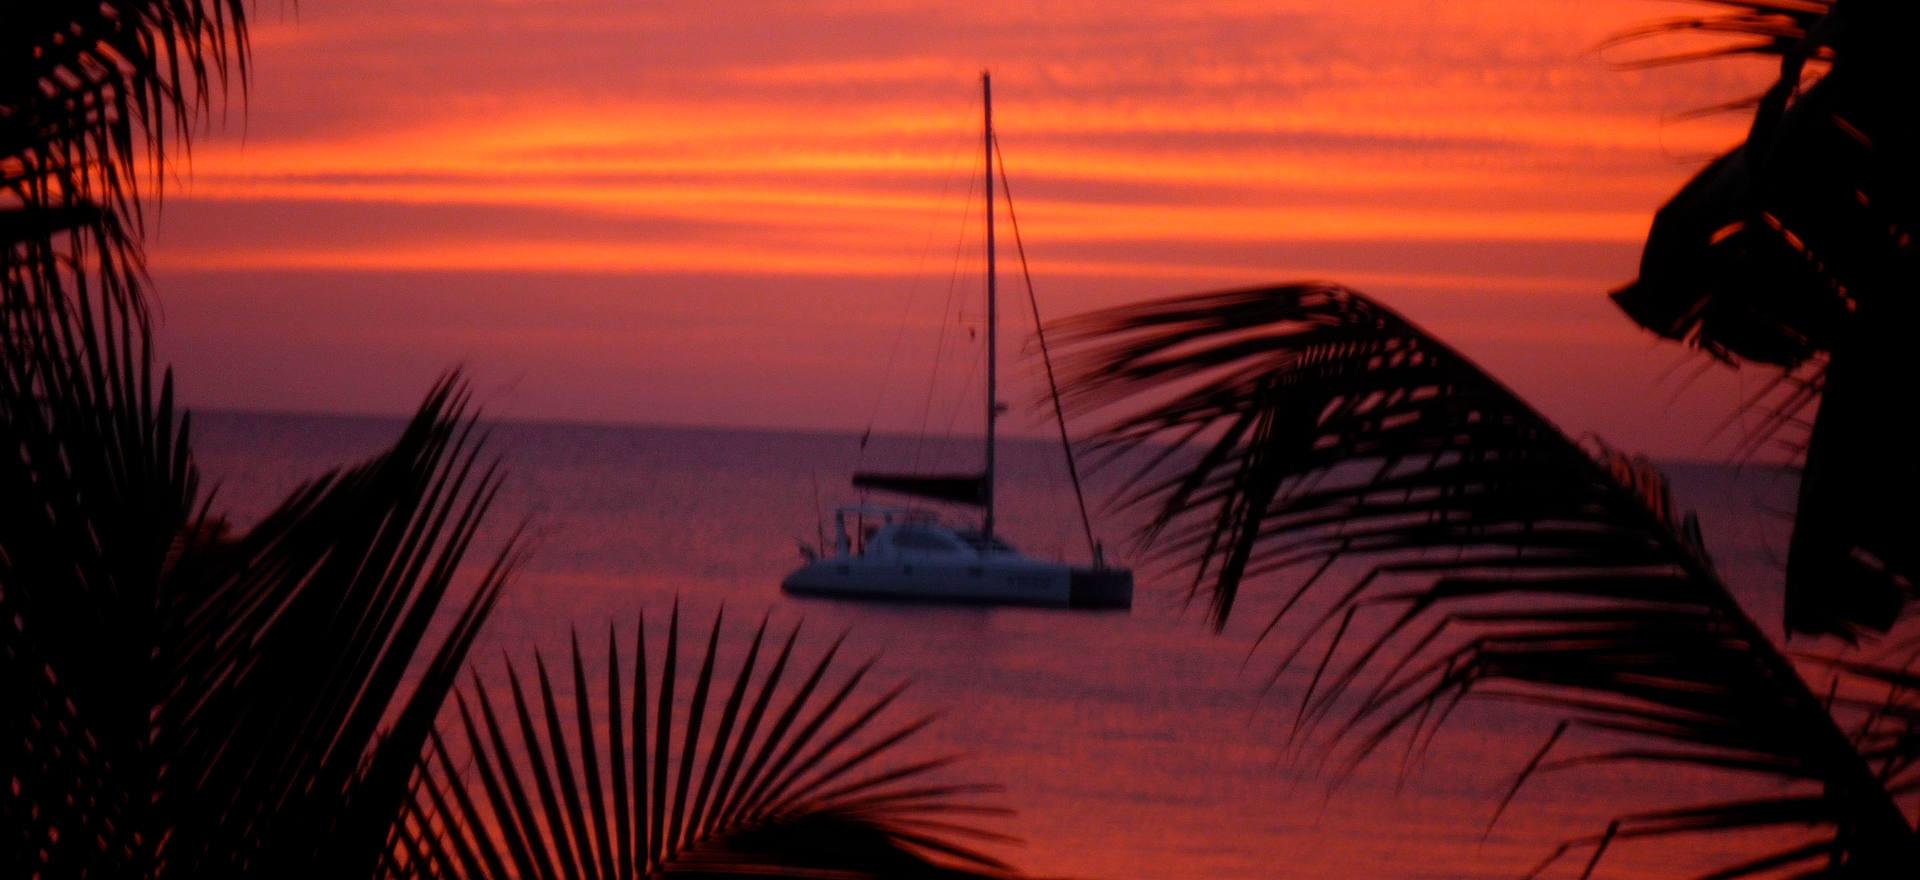 Sunset at Chaconia